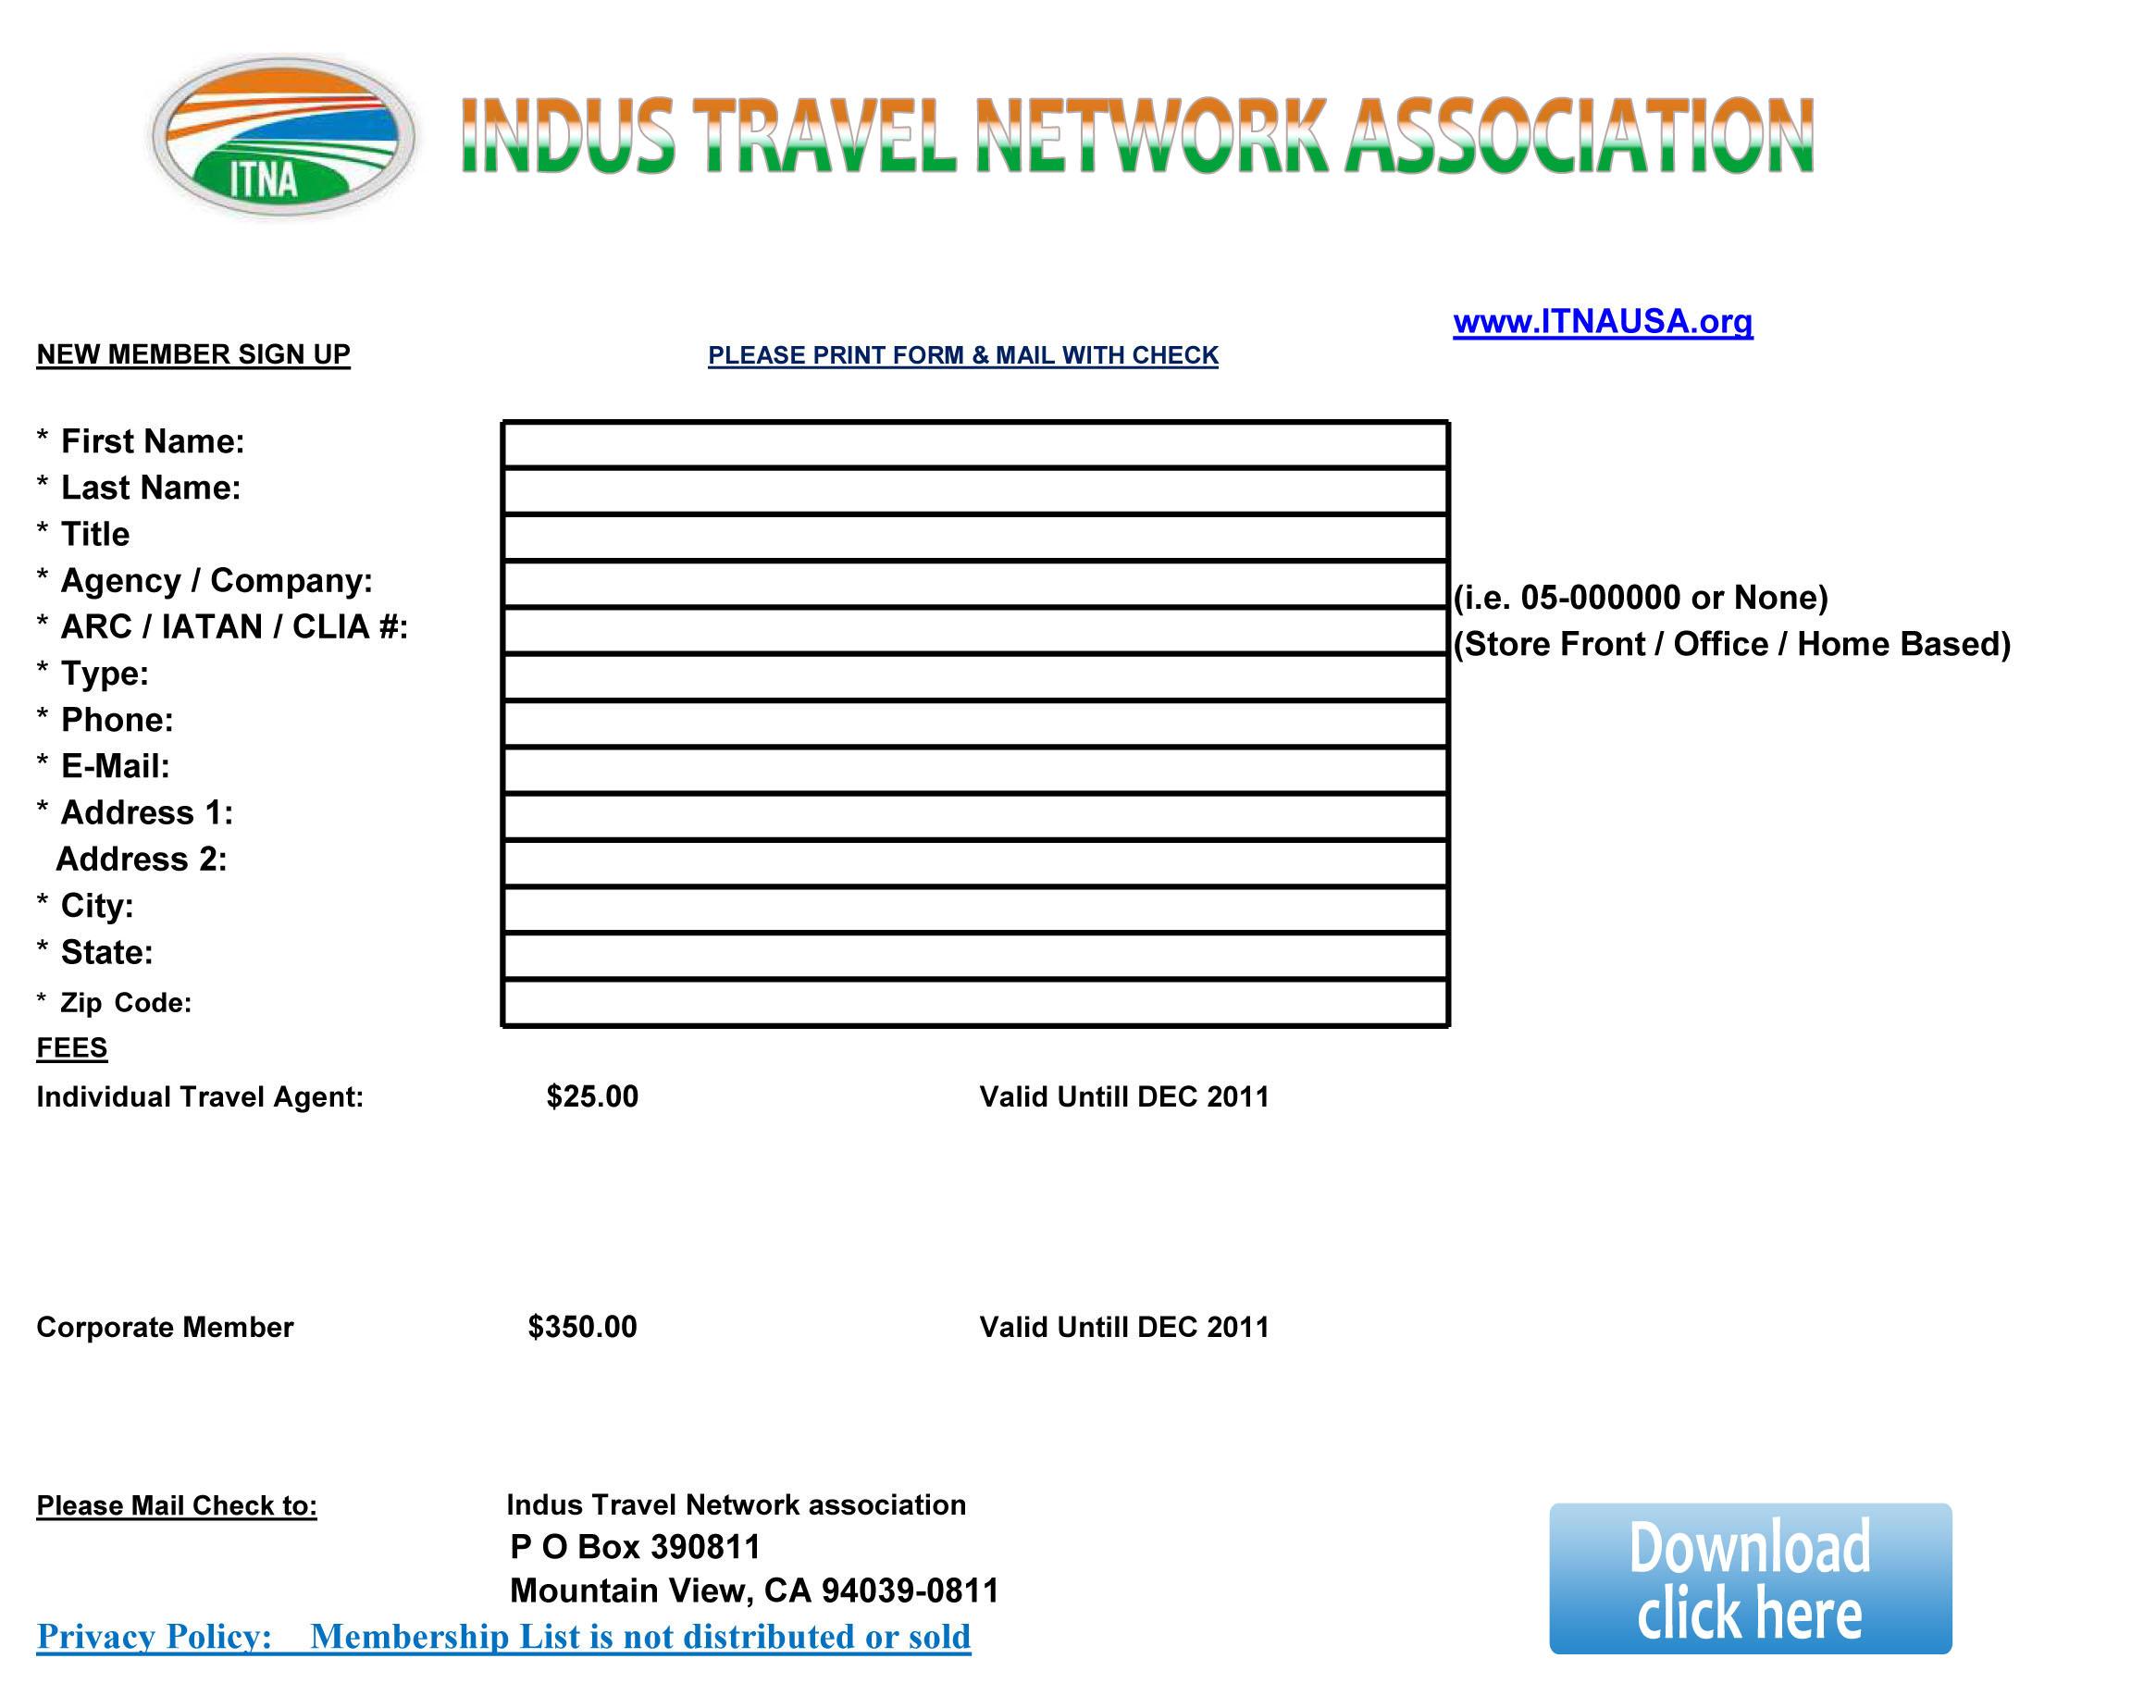 MEMBERSHIP - INDUS TRAVEL NETWORK ASSOCIATION